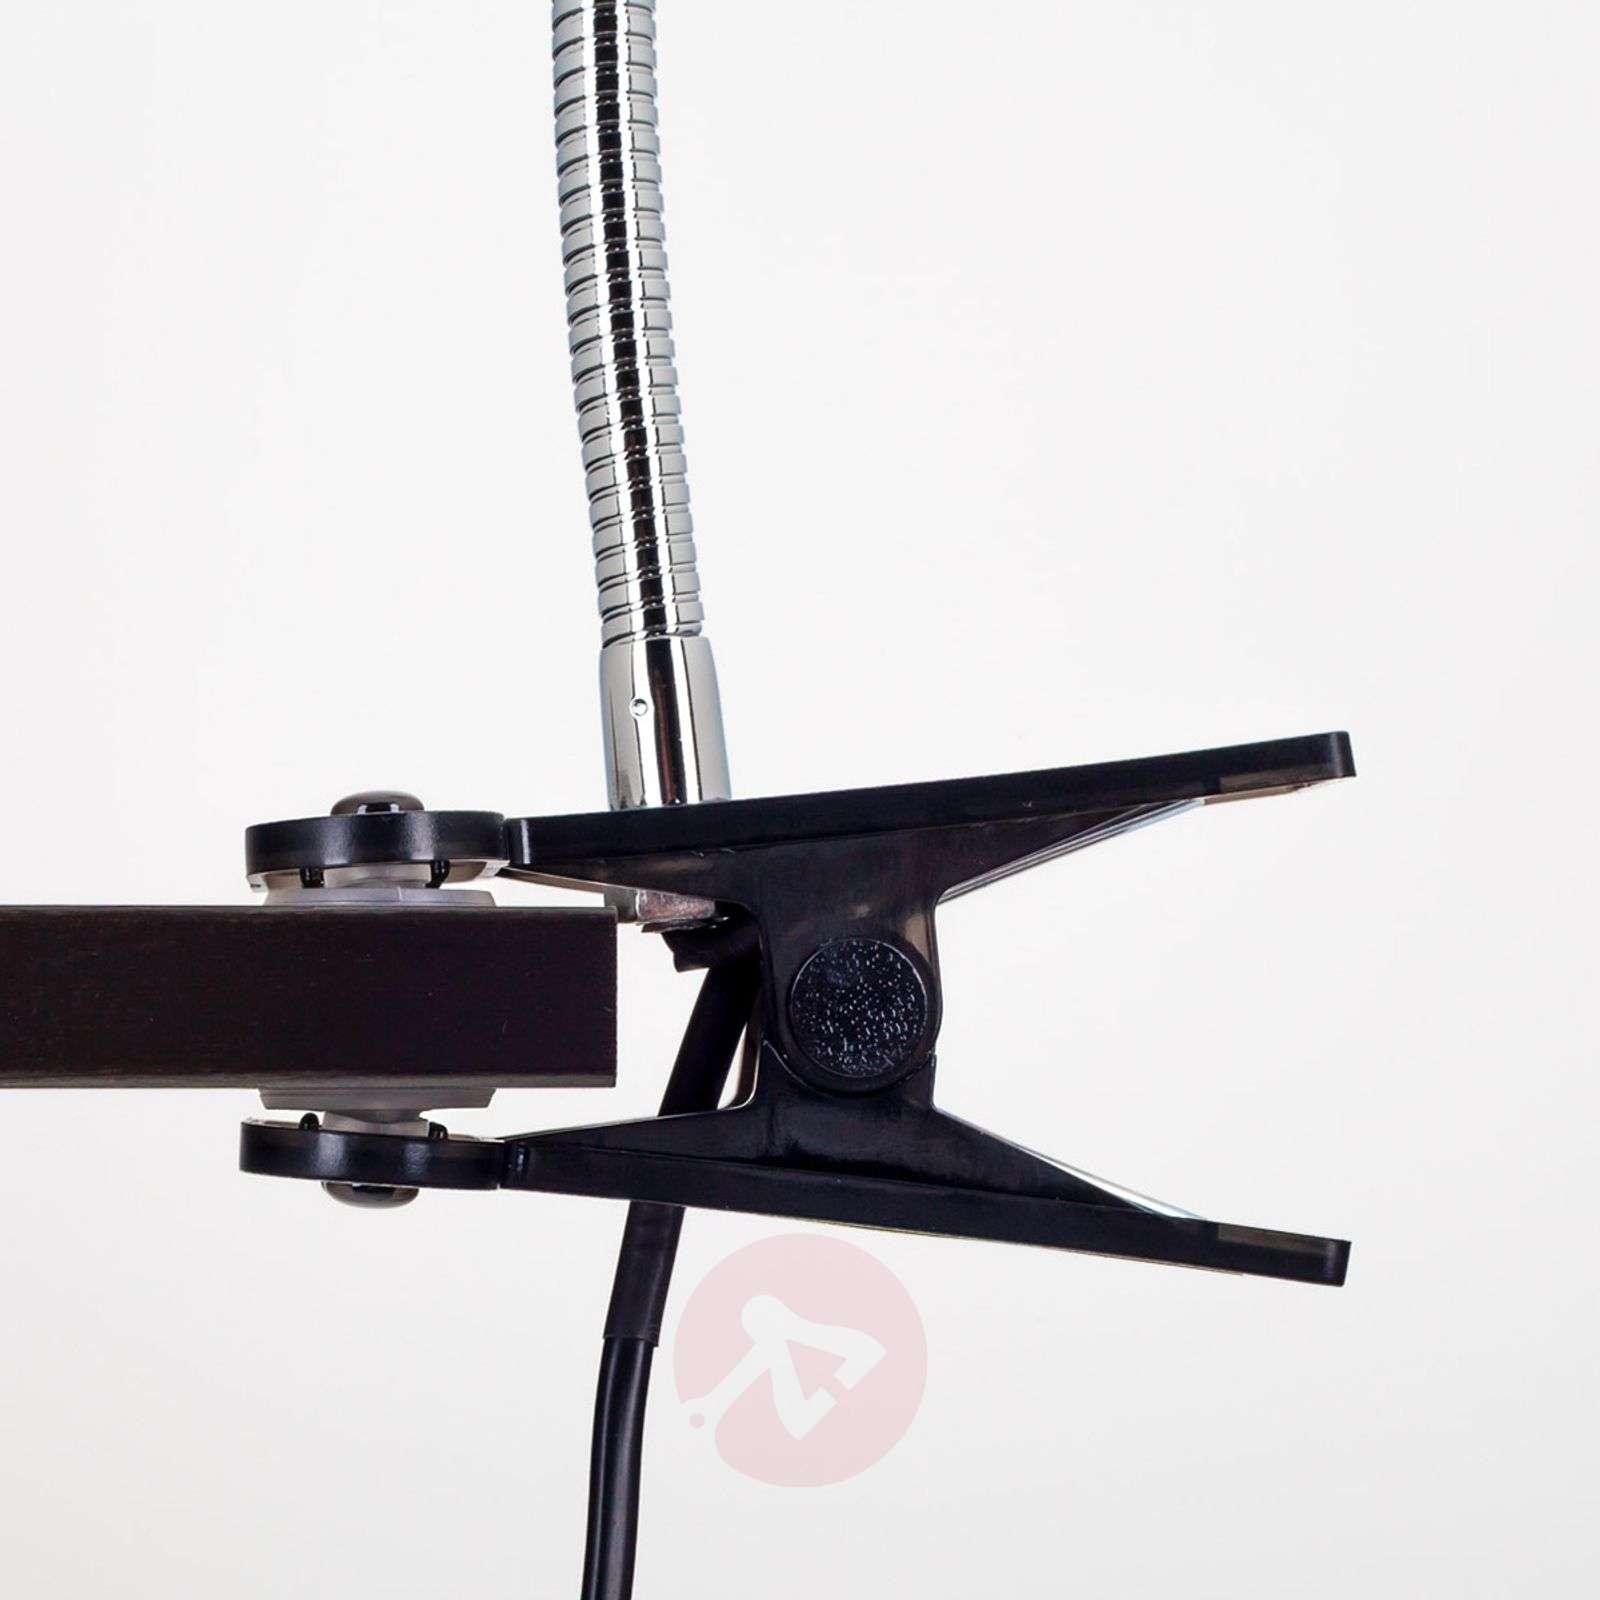 Rabea LED clip-on light in Black-9643007-01